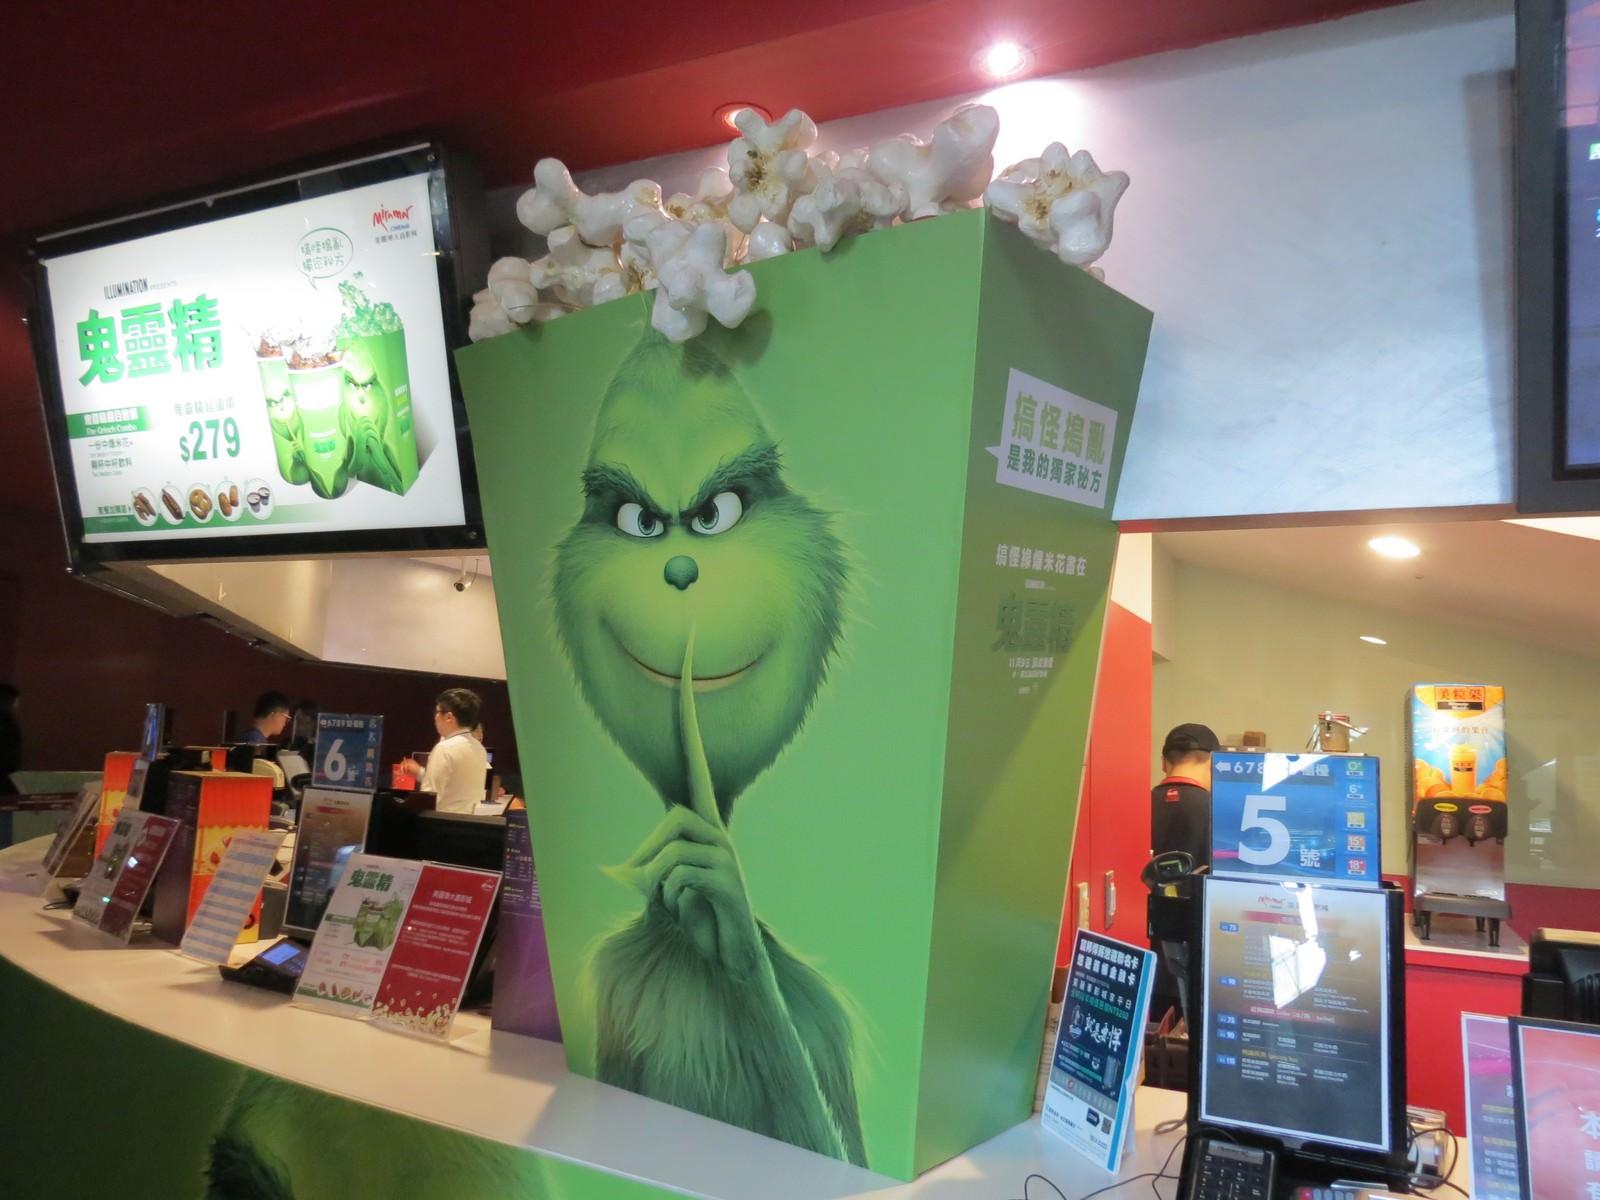 Movie, The Grinch(美國, 2018年) / 鬼靈精(台灣) / 绿毛怪格林奇(中國) / 聖誕怪怪傑(香港), 廣告看板, 美麗華大直影城